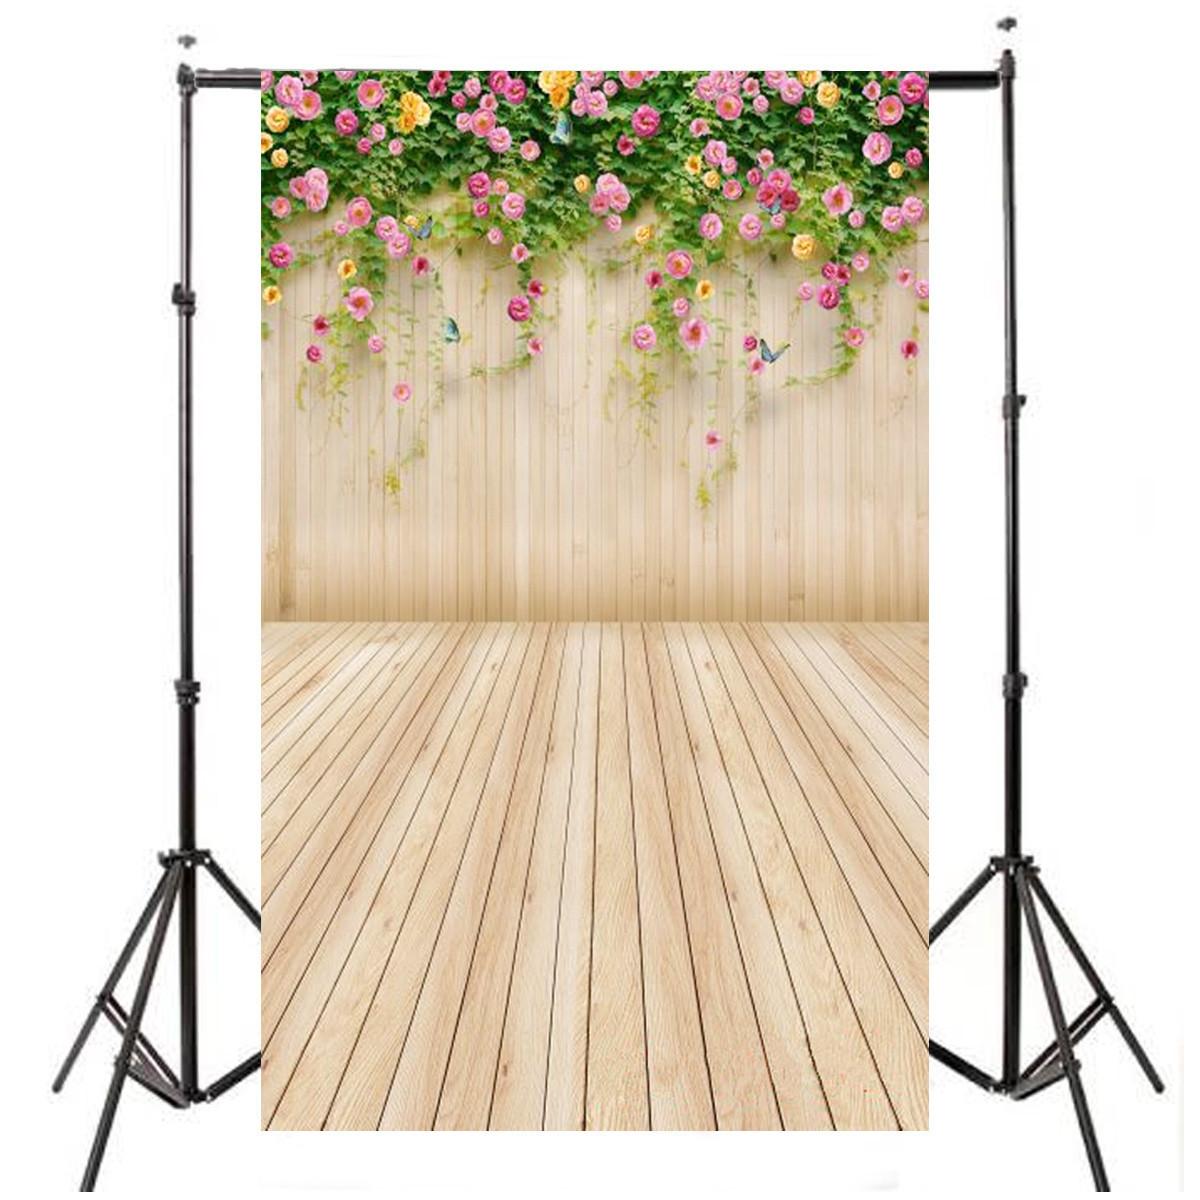 3x5ft flower wood wall vinyl background photography photo studio props - 3x5ft Flower Wood Wall Vinyl Photography Model Backdrop Background Studio Props Lazada Singapore